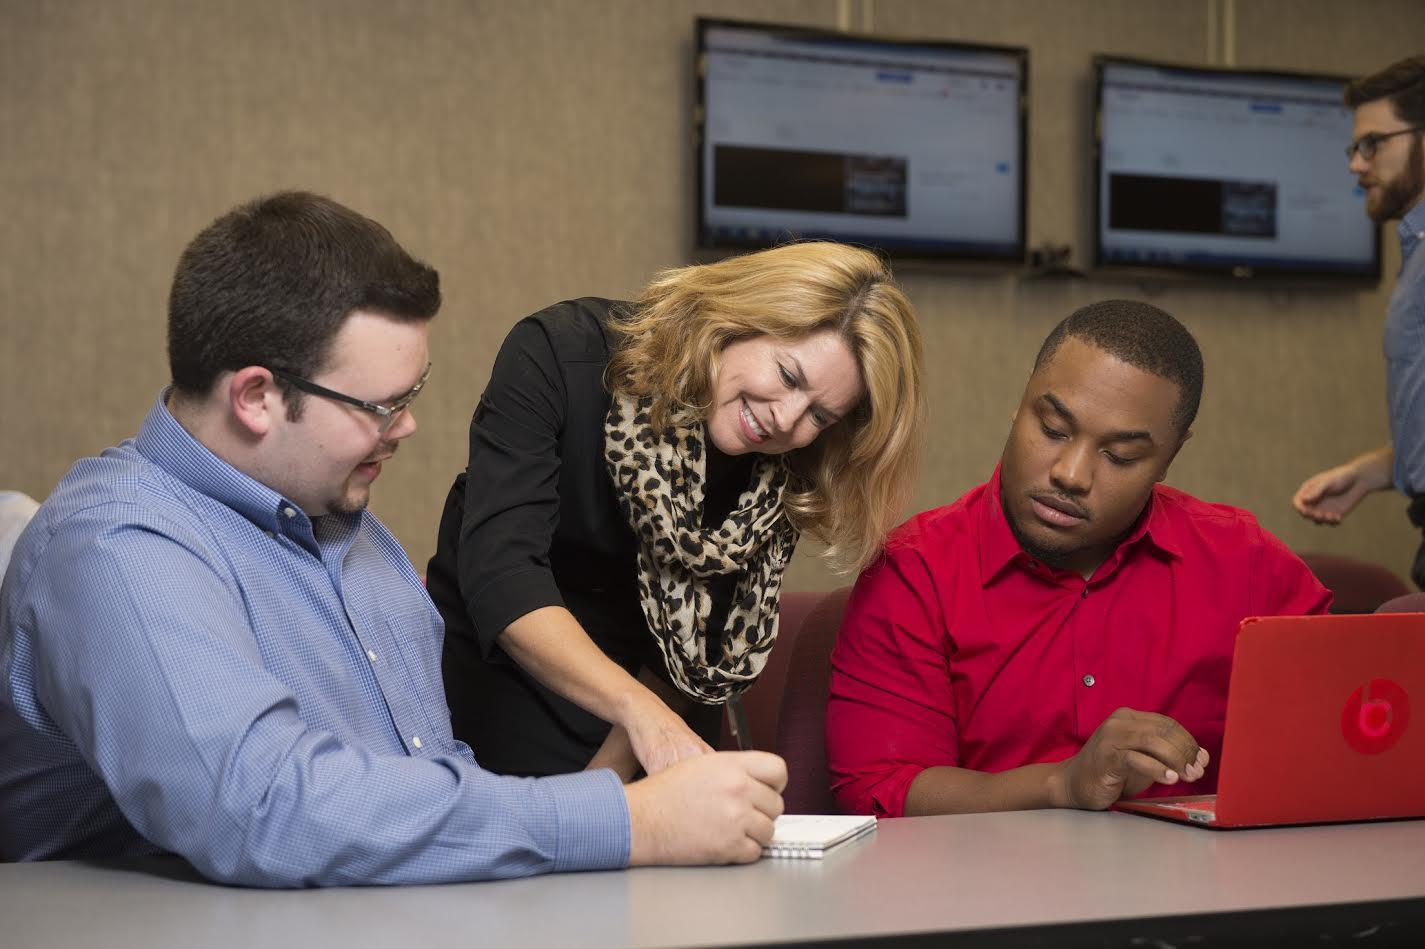 Dr. Michelle K. Johnston, Leadership Coach, Management Professor & Keynote Speaker - Communications Coaching